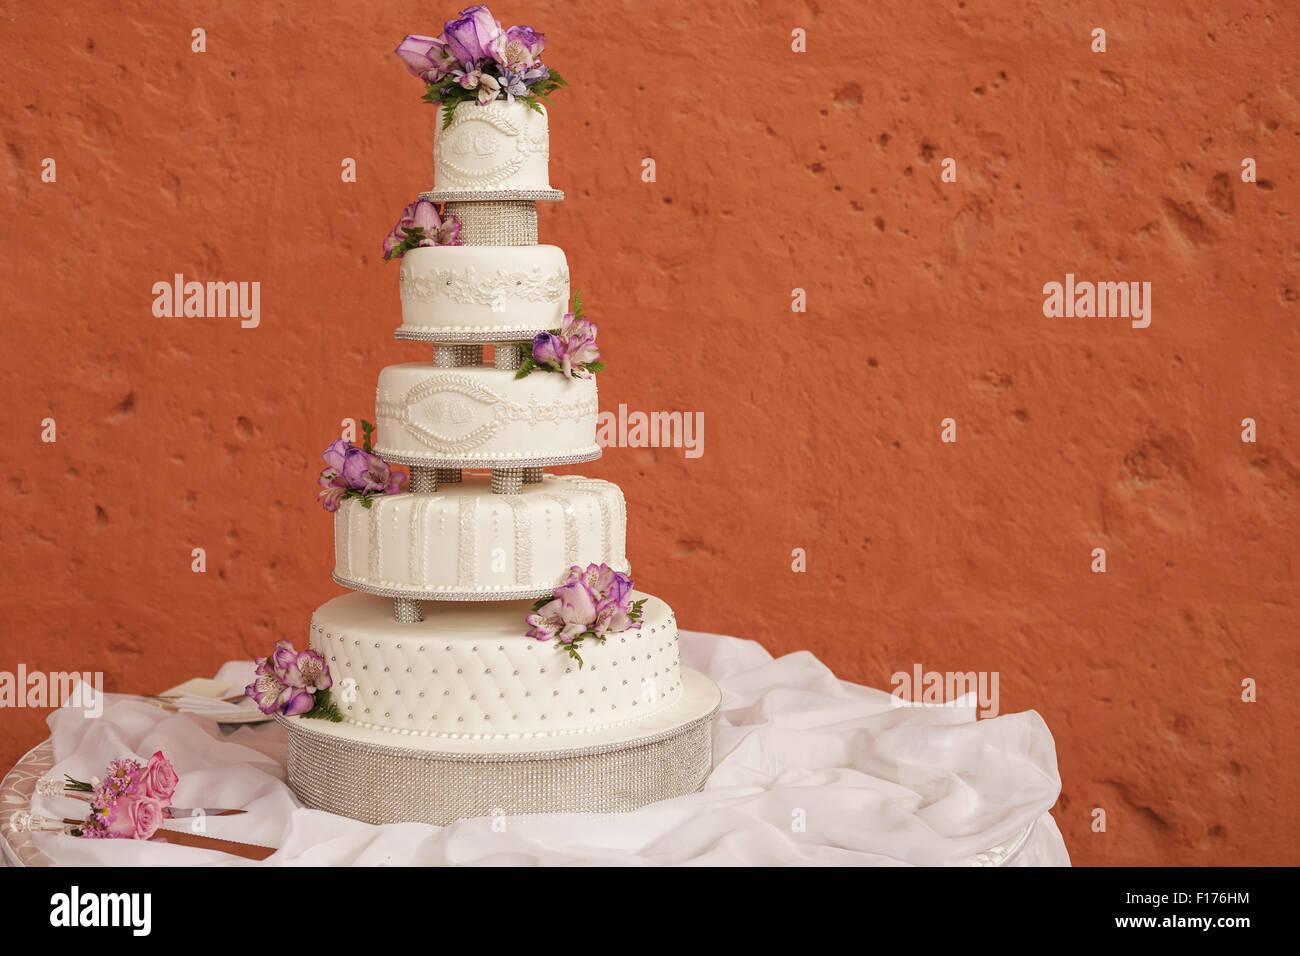 White wedding cake decorated with flowers - Stock Image